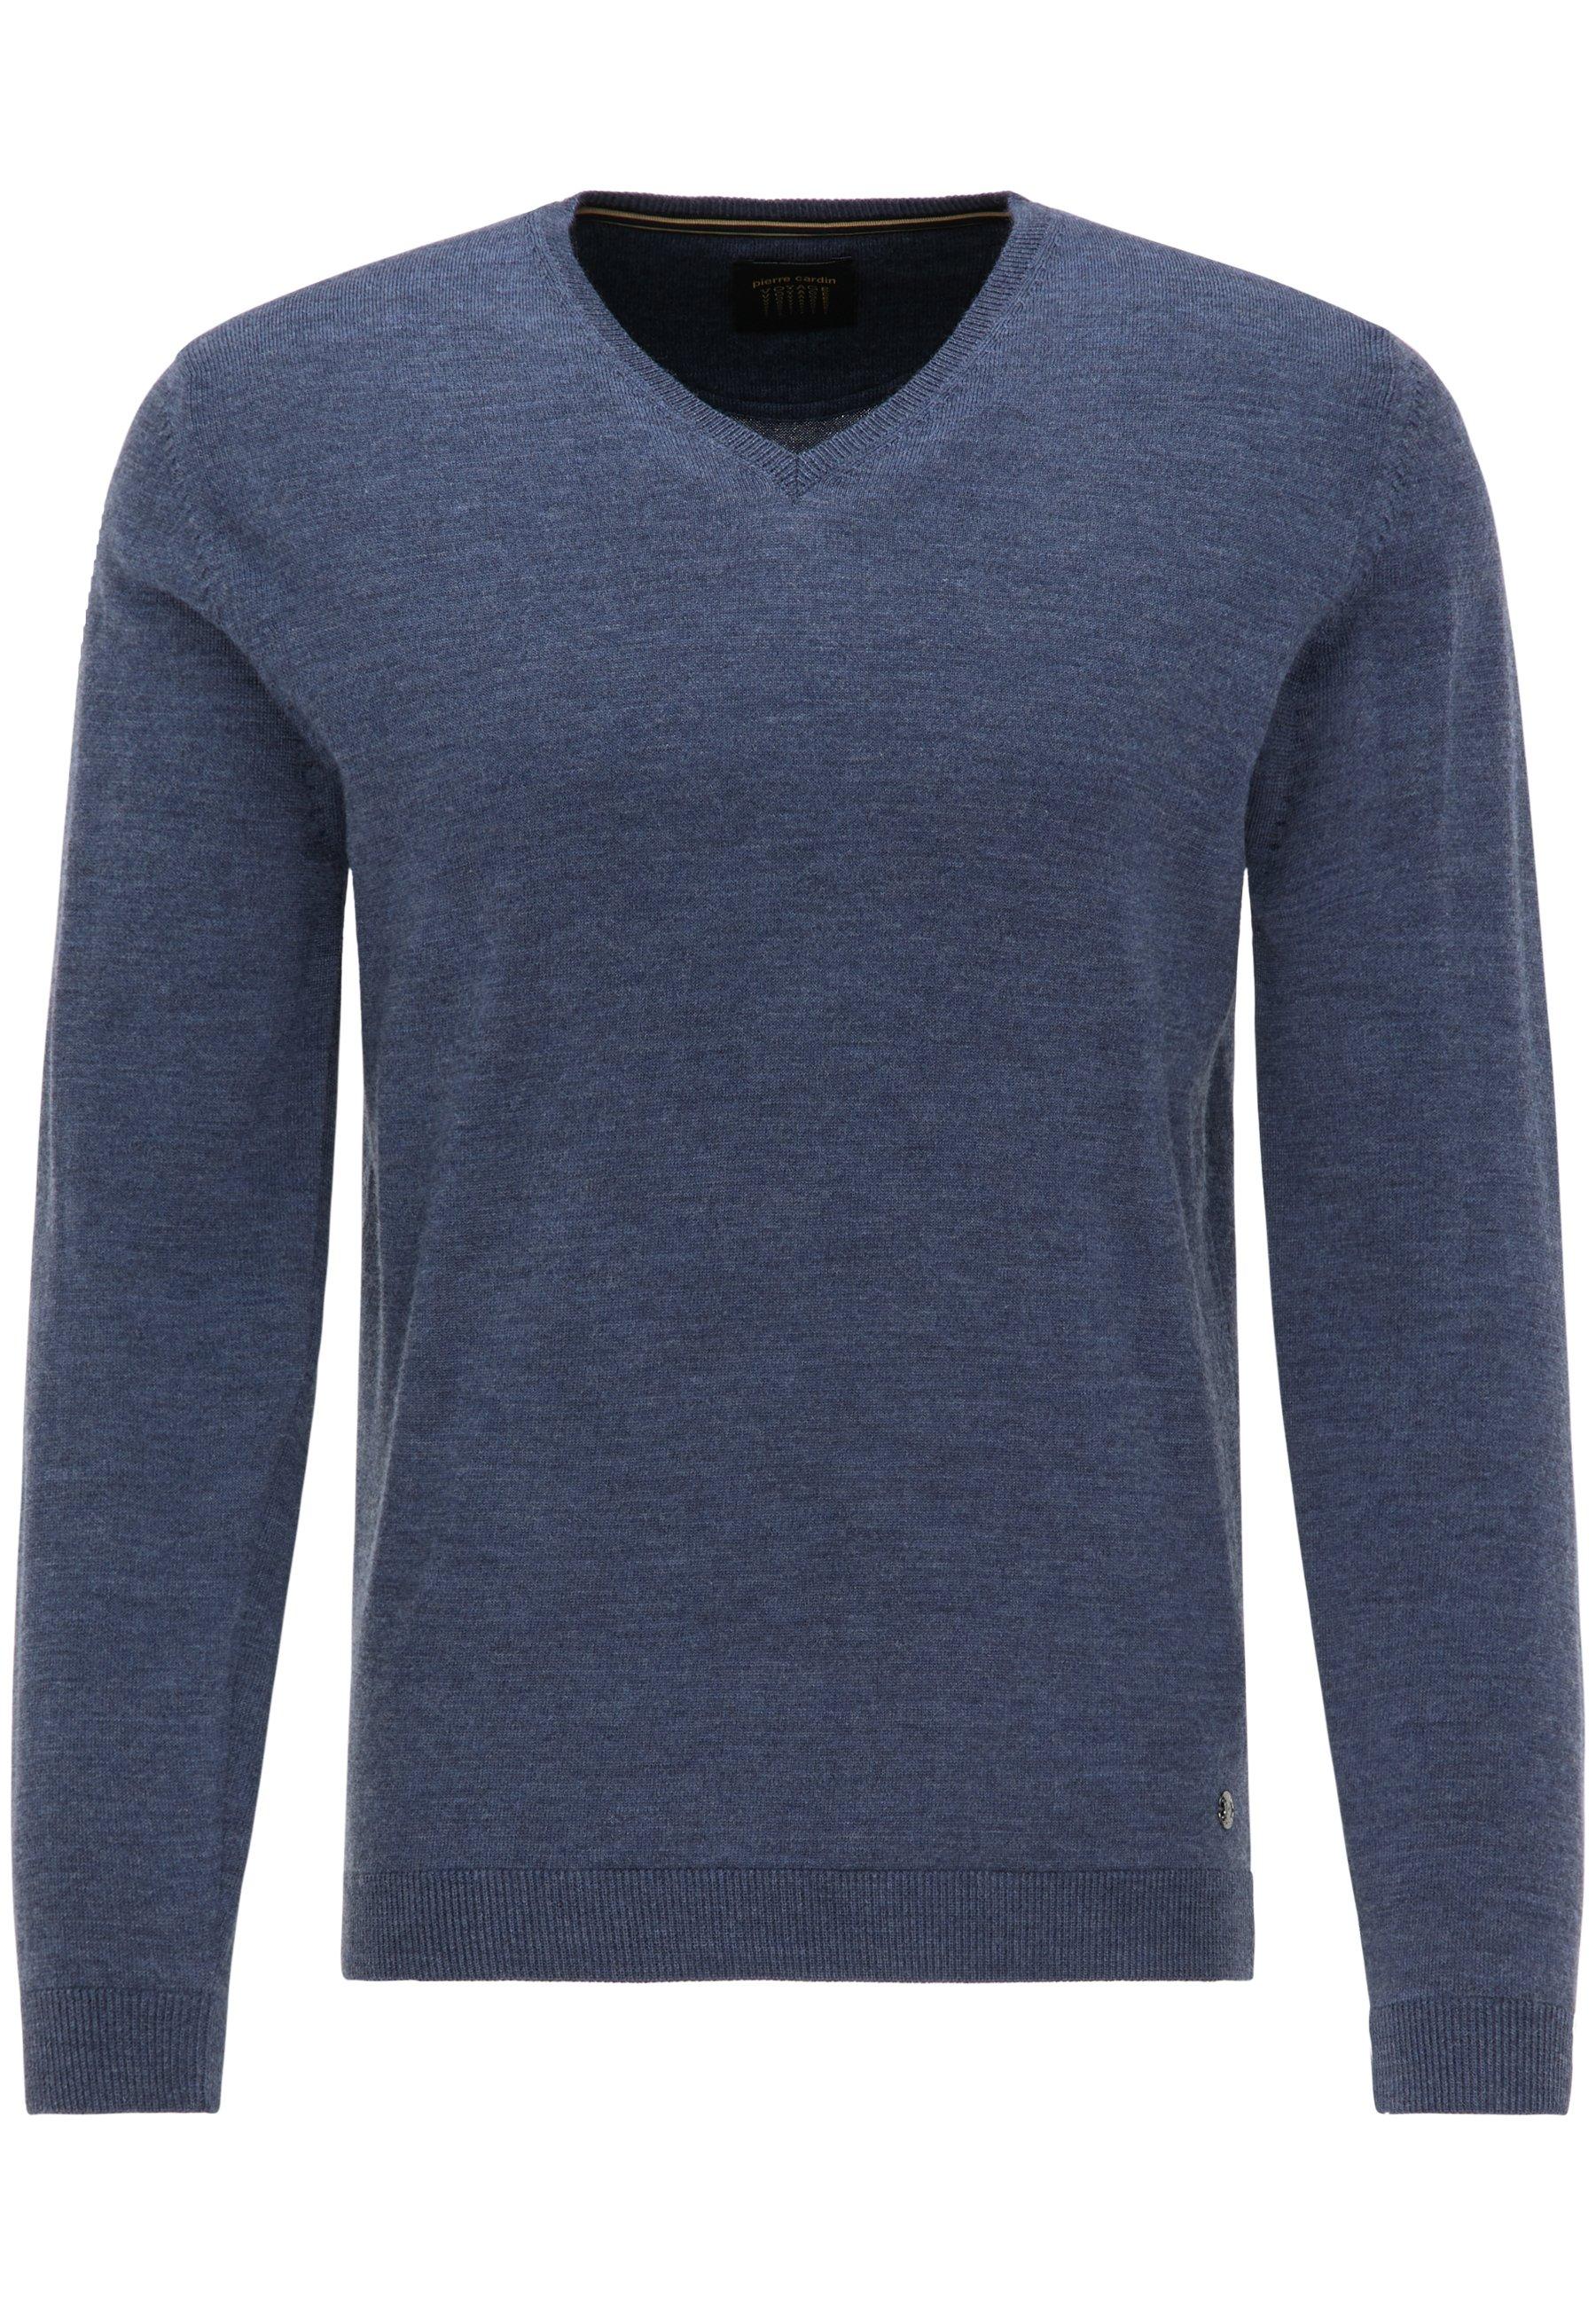 Pierre Cardin heren trui blauw melange